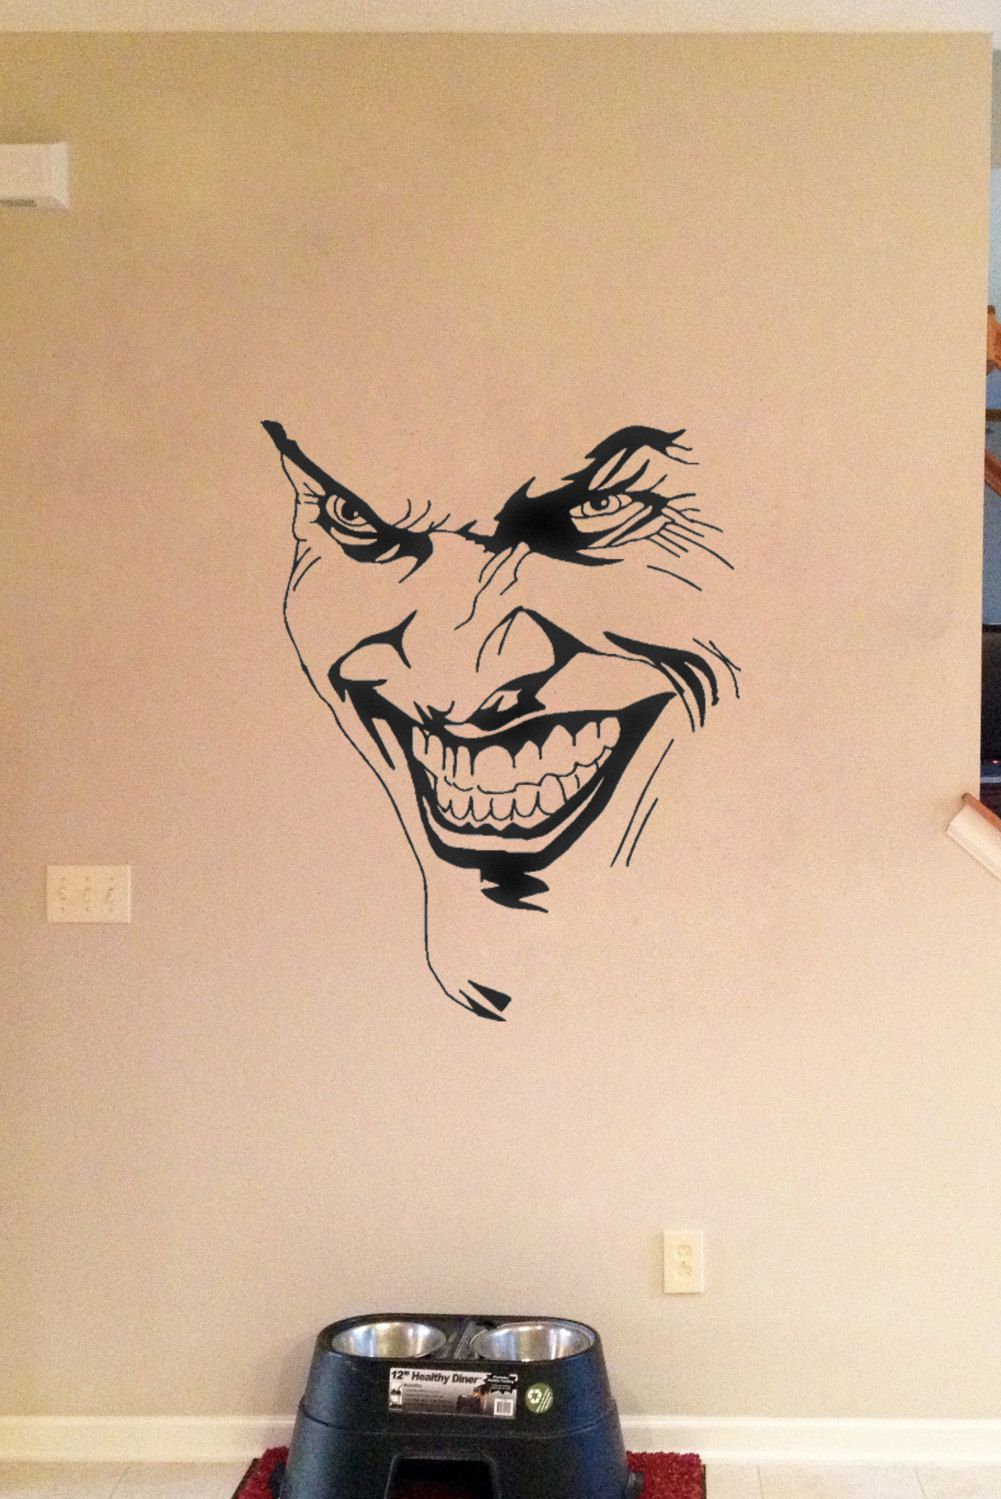 Batman Decal Joker Decal Dc Comic Decal Batman Vinyl Decal Joker Vinyl Decal Joker Car Decal Batman Car Decal Dc Comic Ca Batman Decals Vinyl Decals Batman Car [ 1499 x 1001 Pixel ]